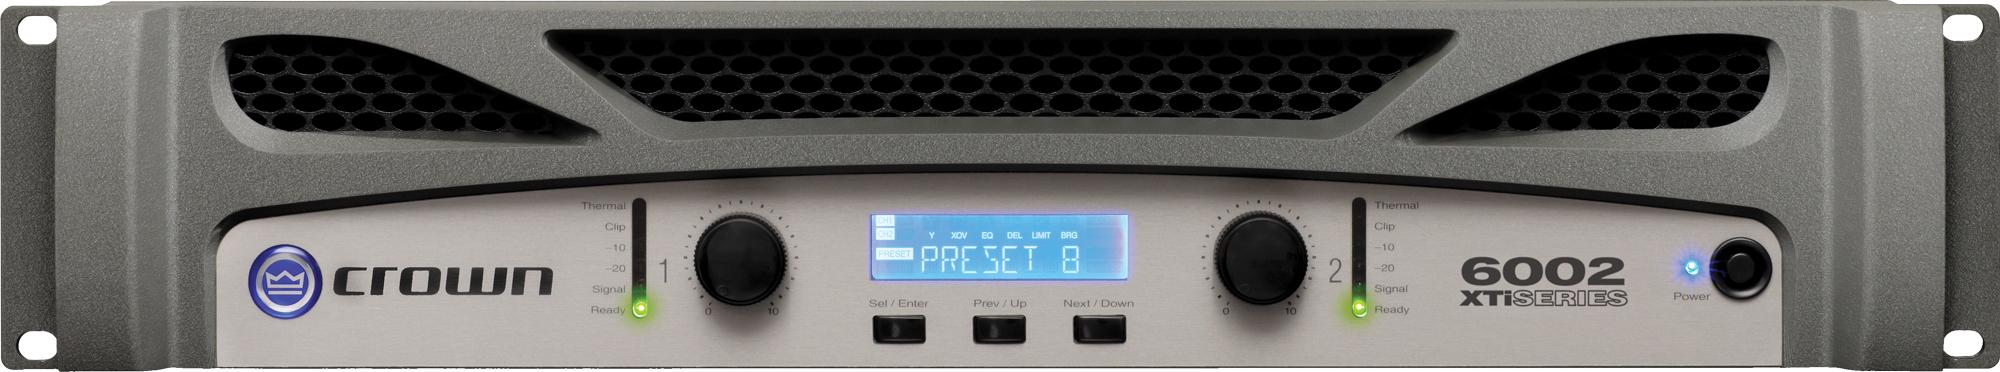 crown xti 6002 2 channel 2100w 4 ohms power amplifier. Black Bedroom Furniture Sets. Home Design Ideas